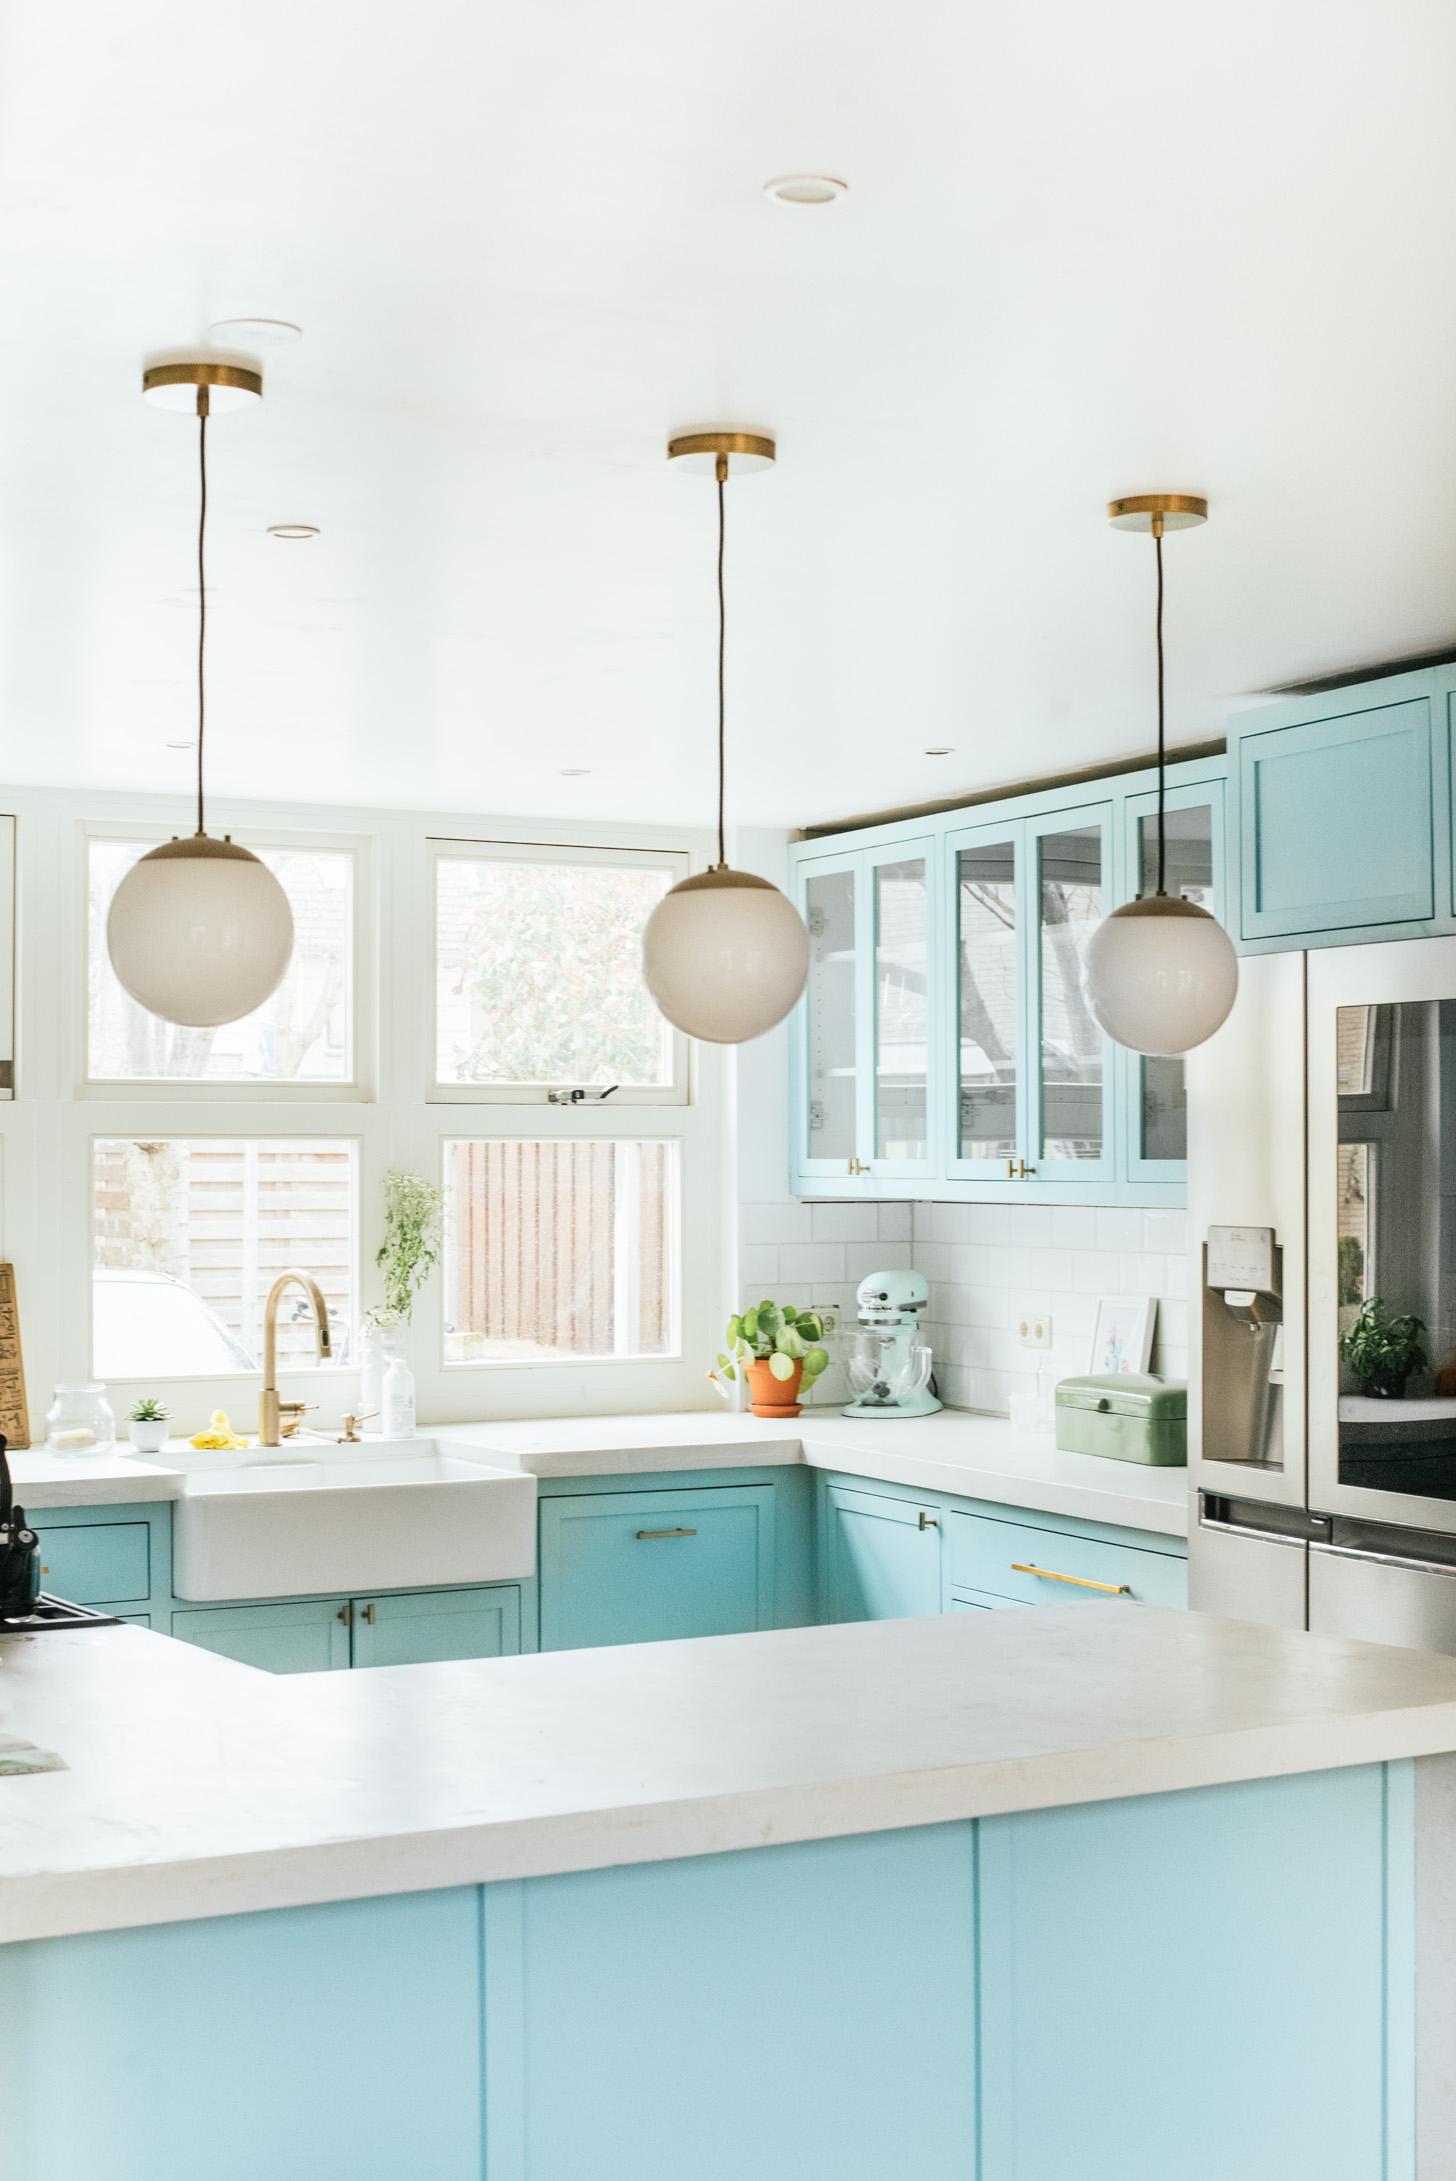 Beste Keukengreepjes & lampen in de keuken | A Cup of Life VA-48